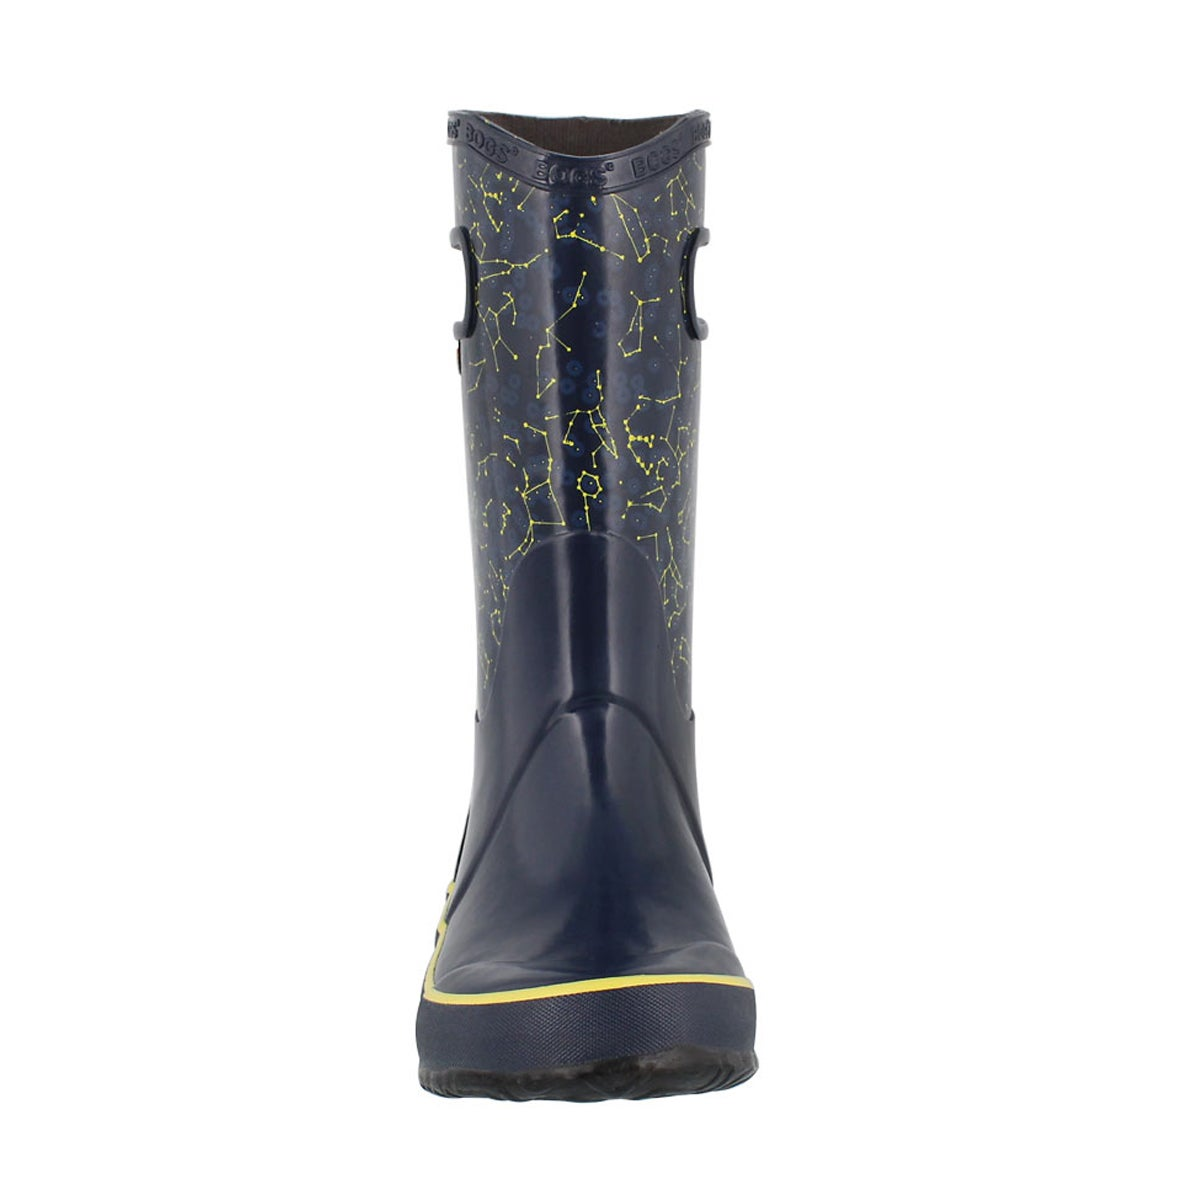 Kds Constellations blu multi rain boot